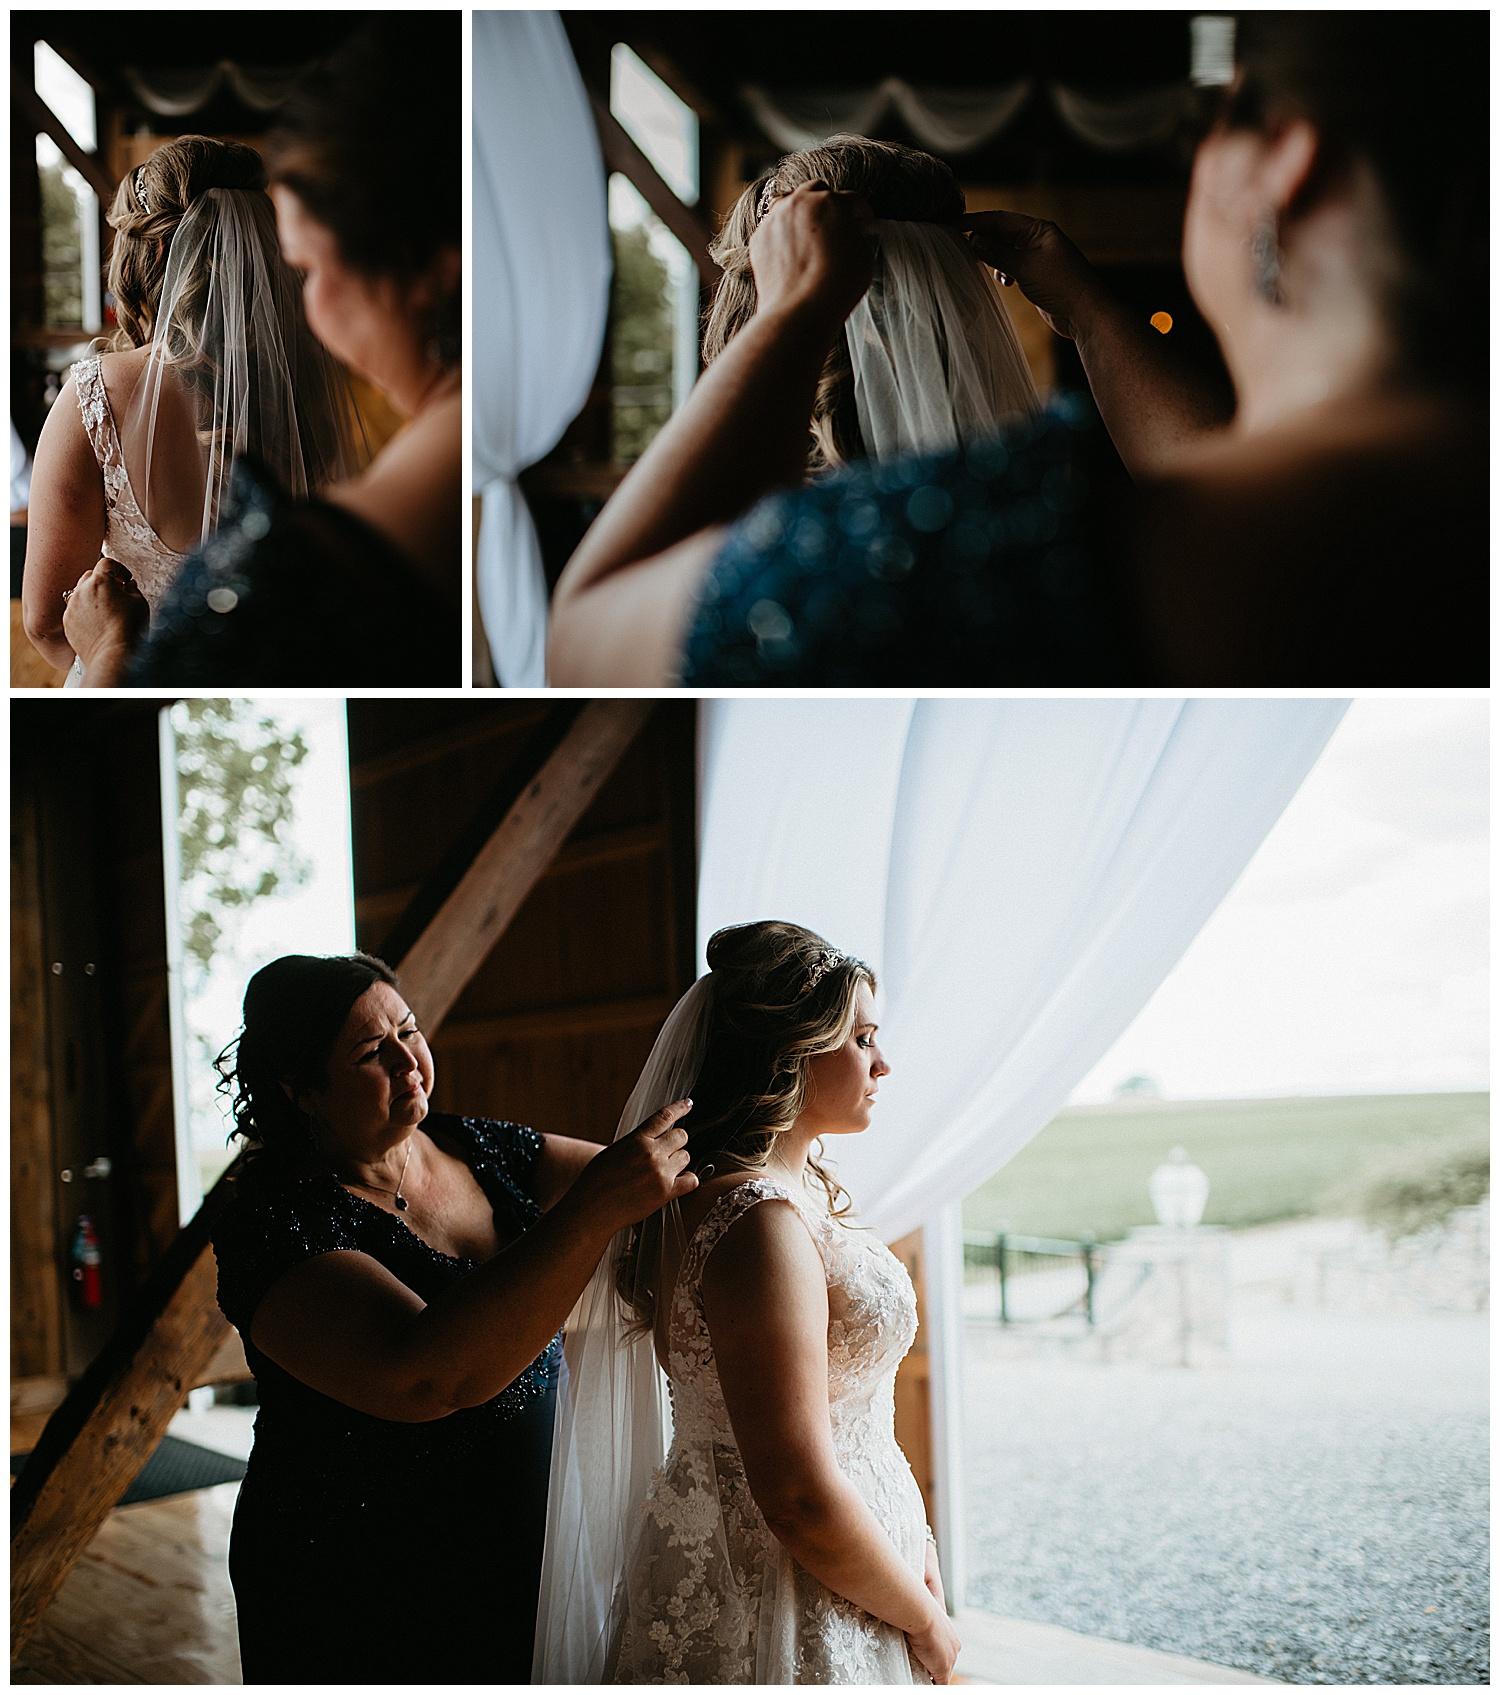 NEPA-Bloomgsburg-Wedding-Photographer-at-The-Barn-at-Greystone-Farms-Watsontown-PA_0016.jpg